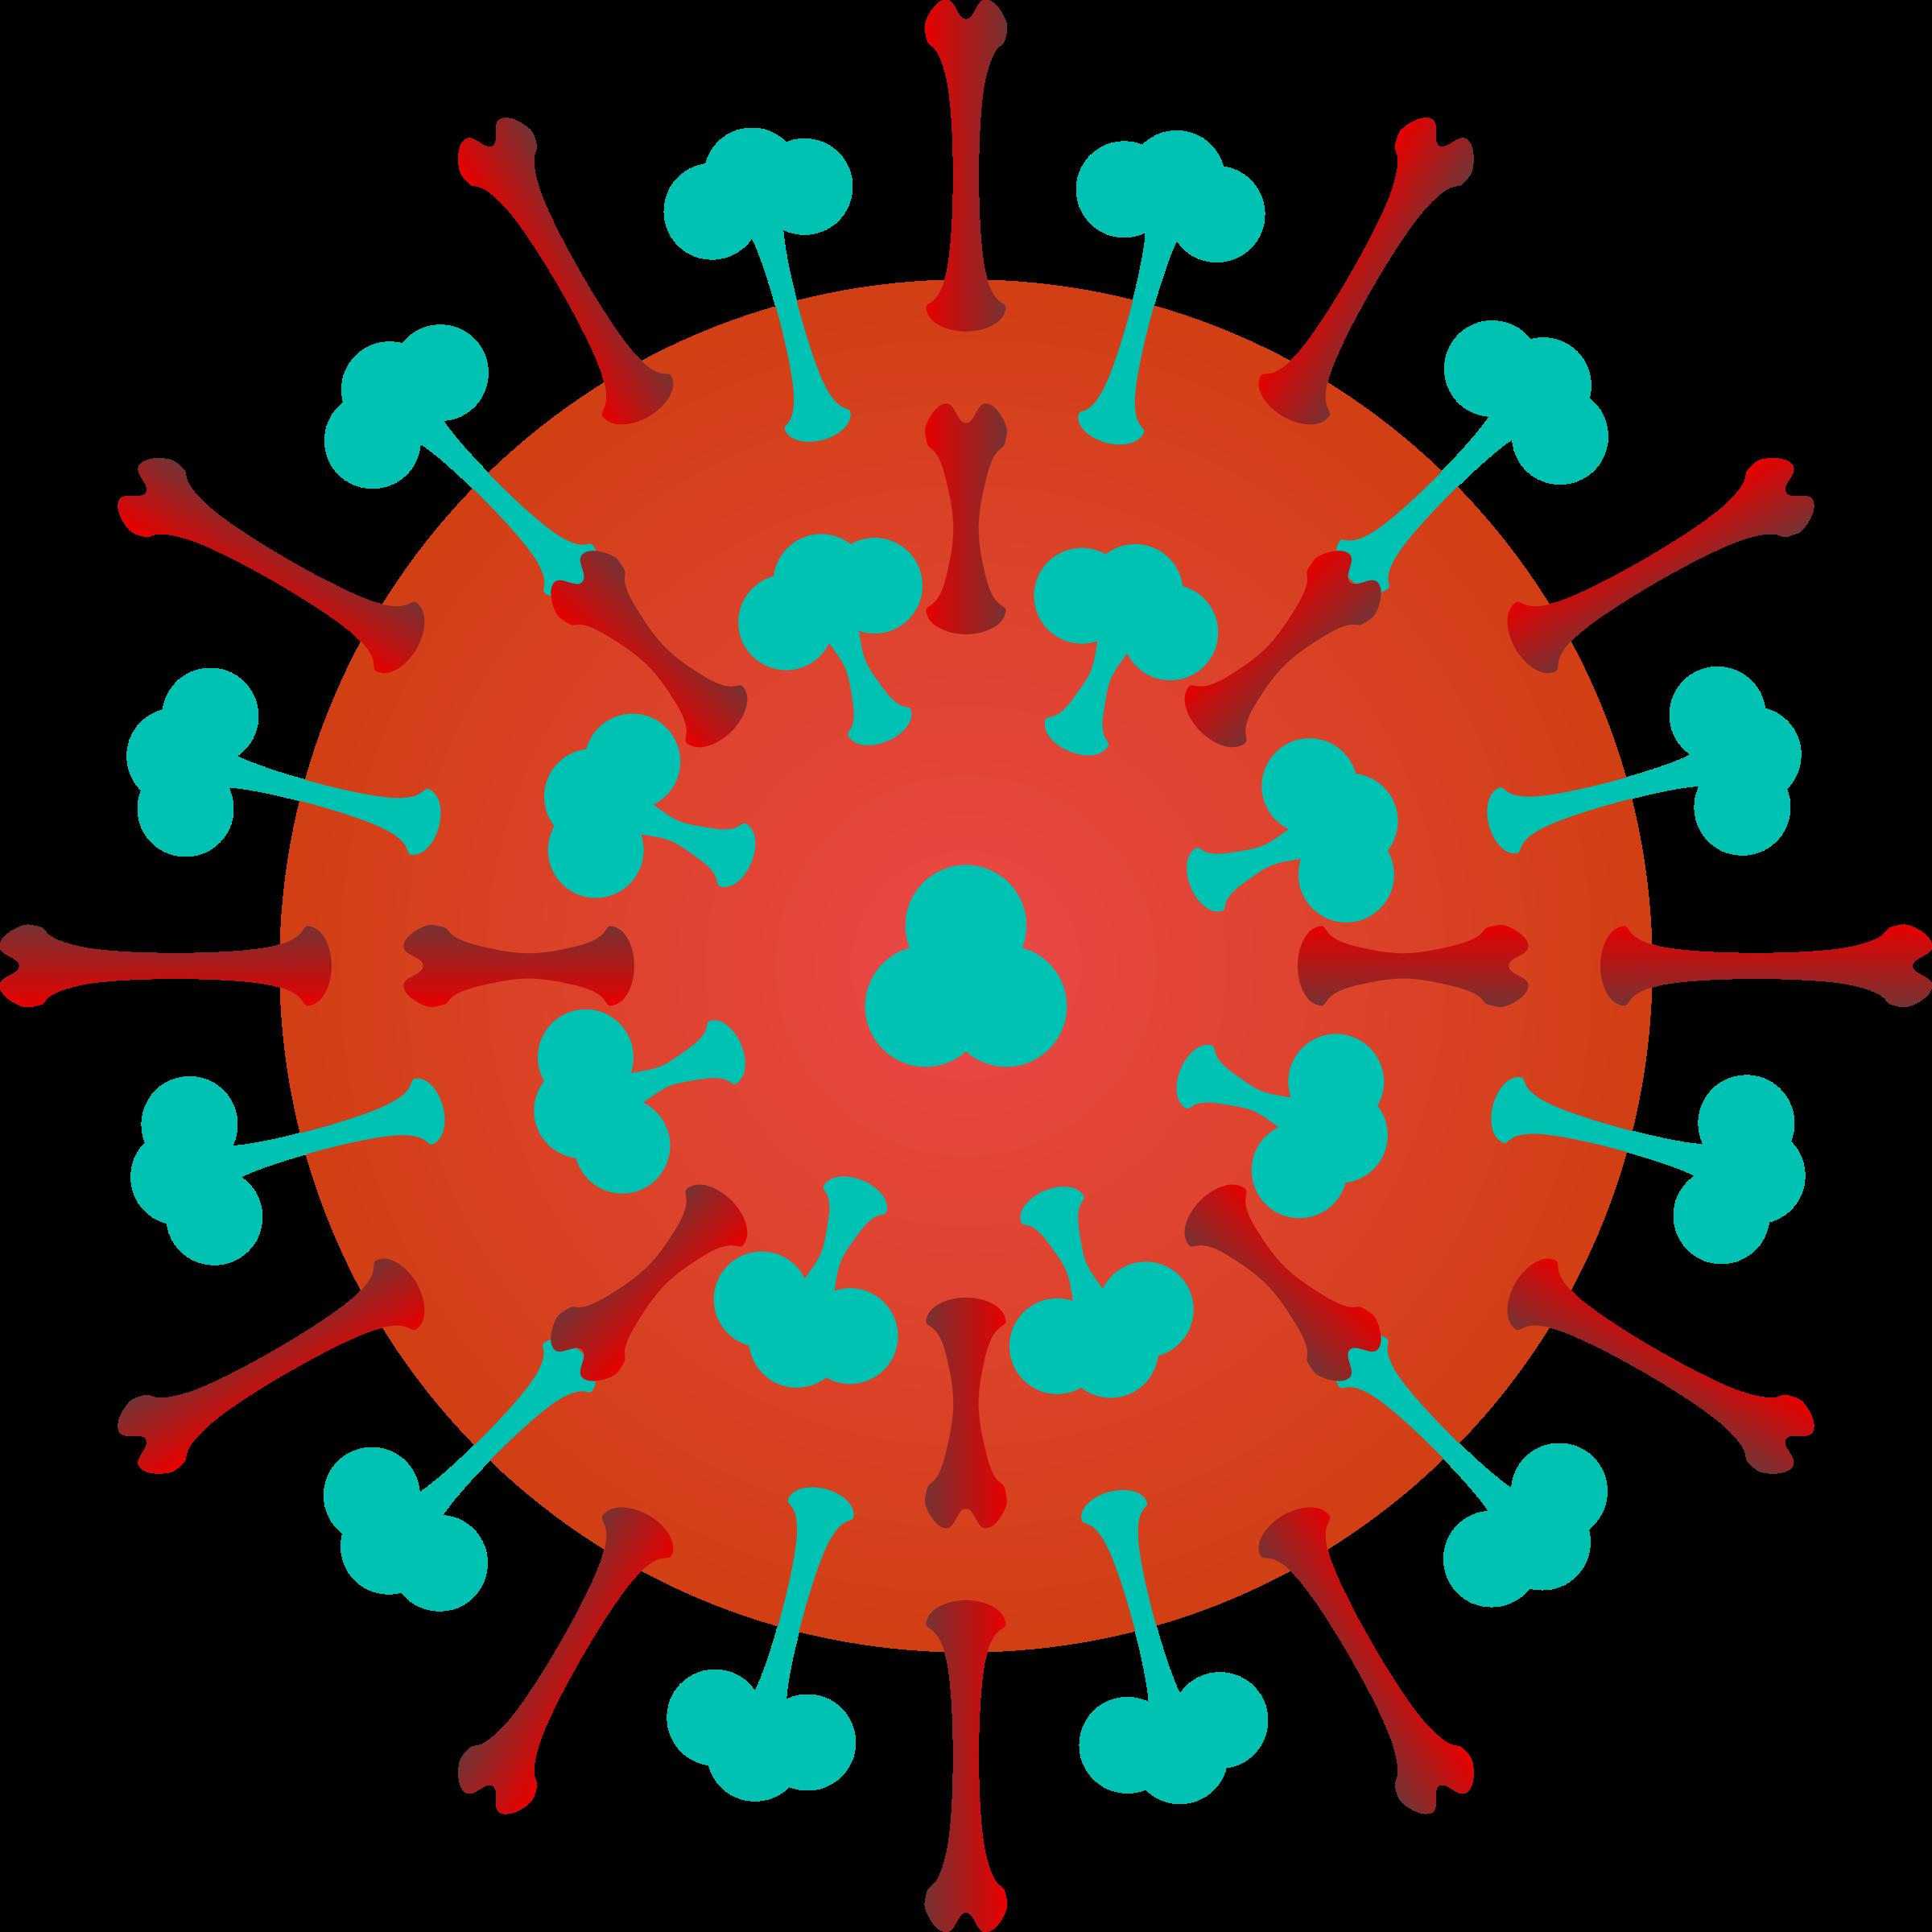 BIG IMAGE (PNG) - PNG Flu